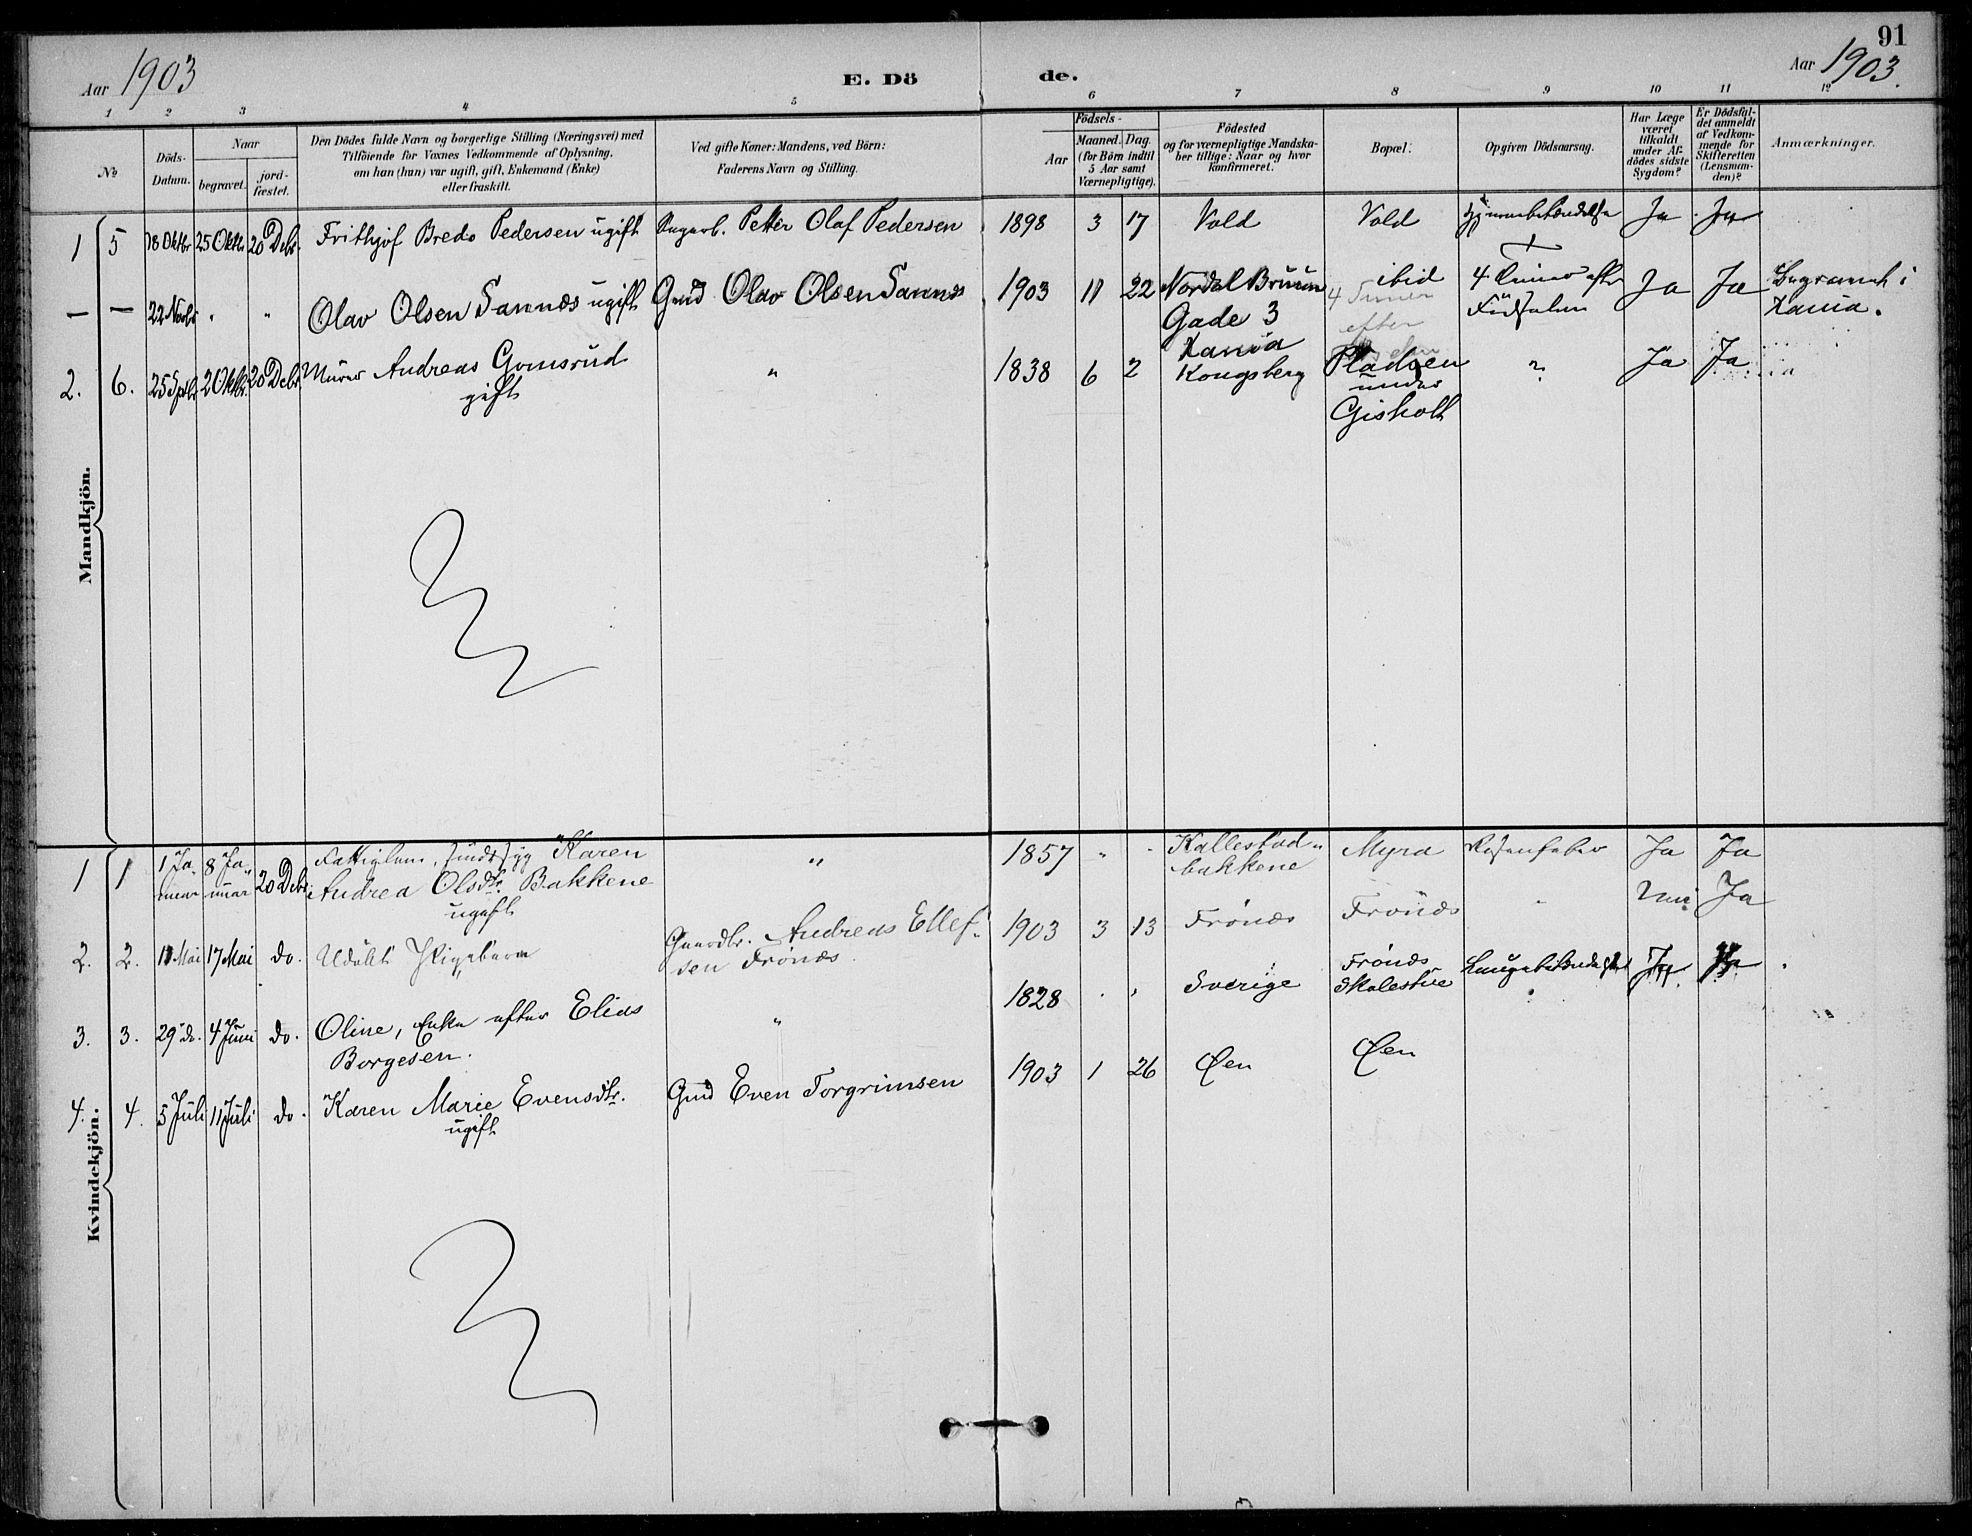 SAKO, Solum kirkebøker, F/Fc/L0002: Ministerialbok nr. III 2, 1892-1906, s. 91